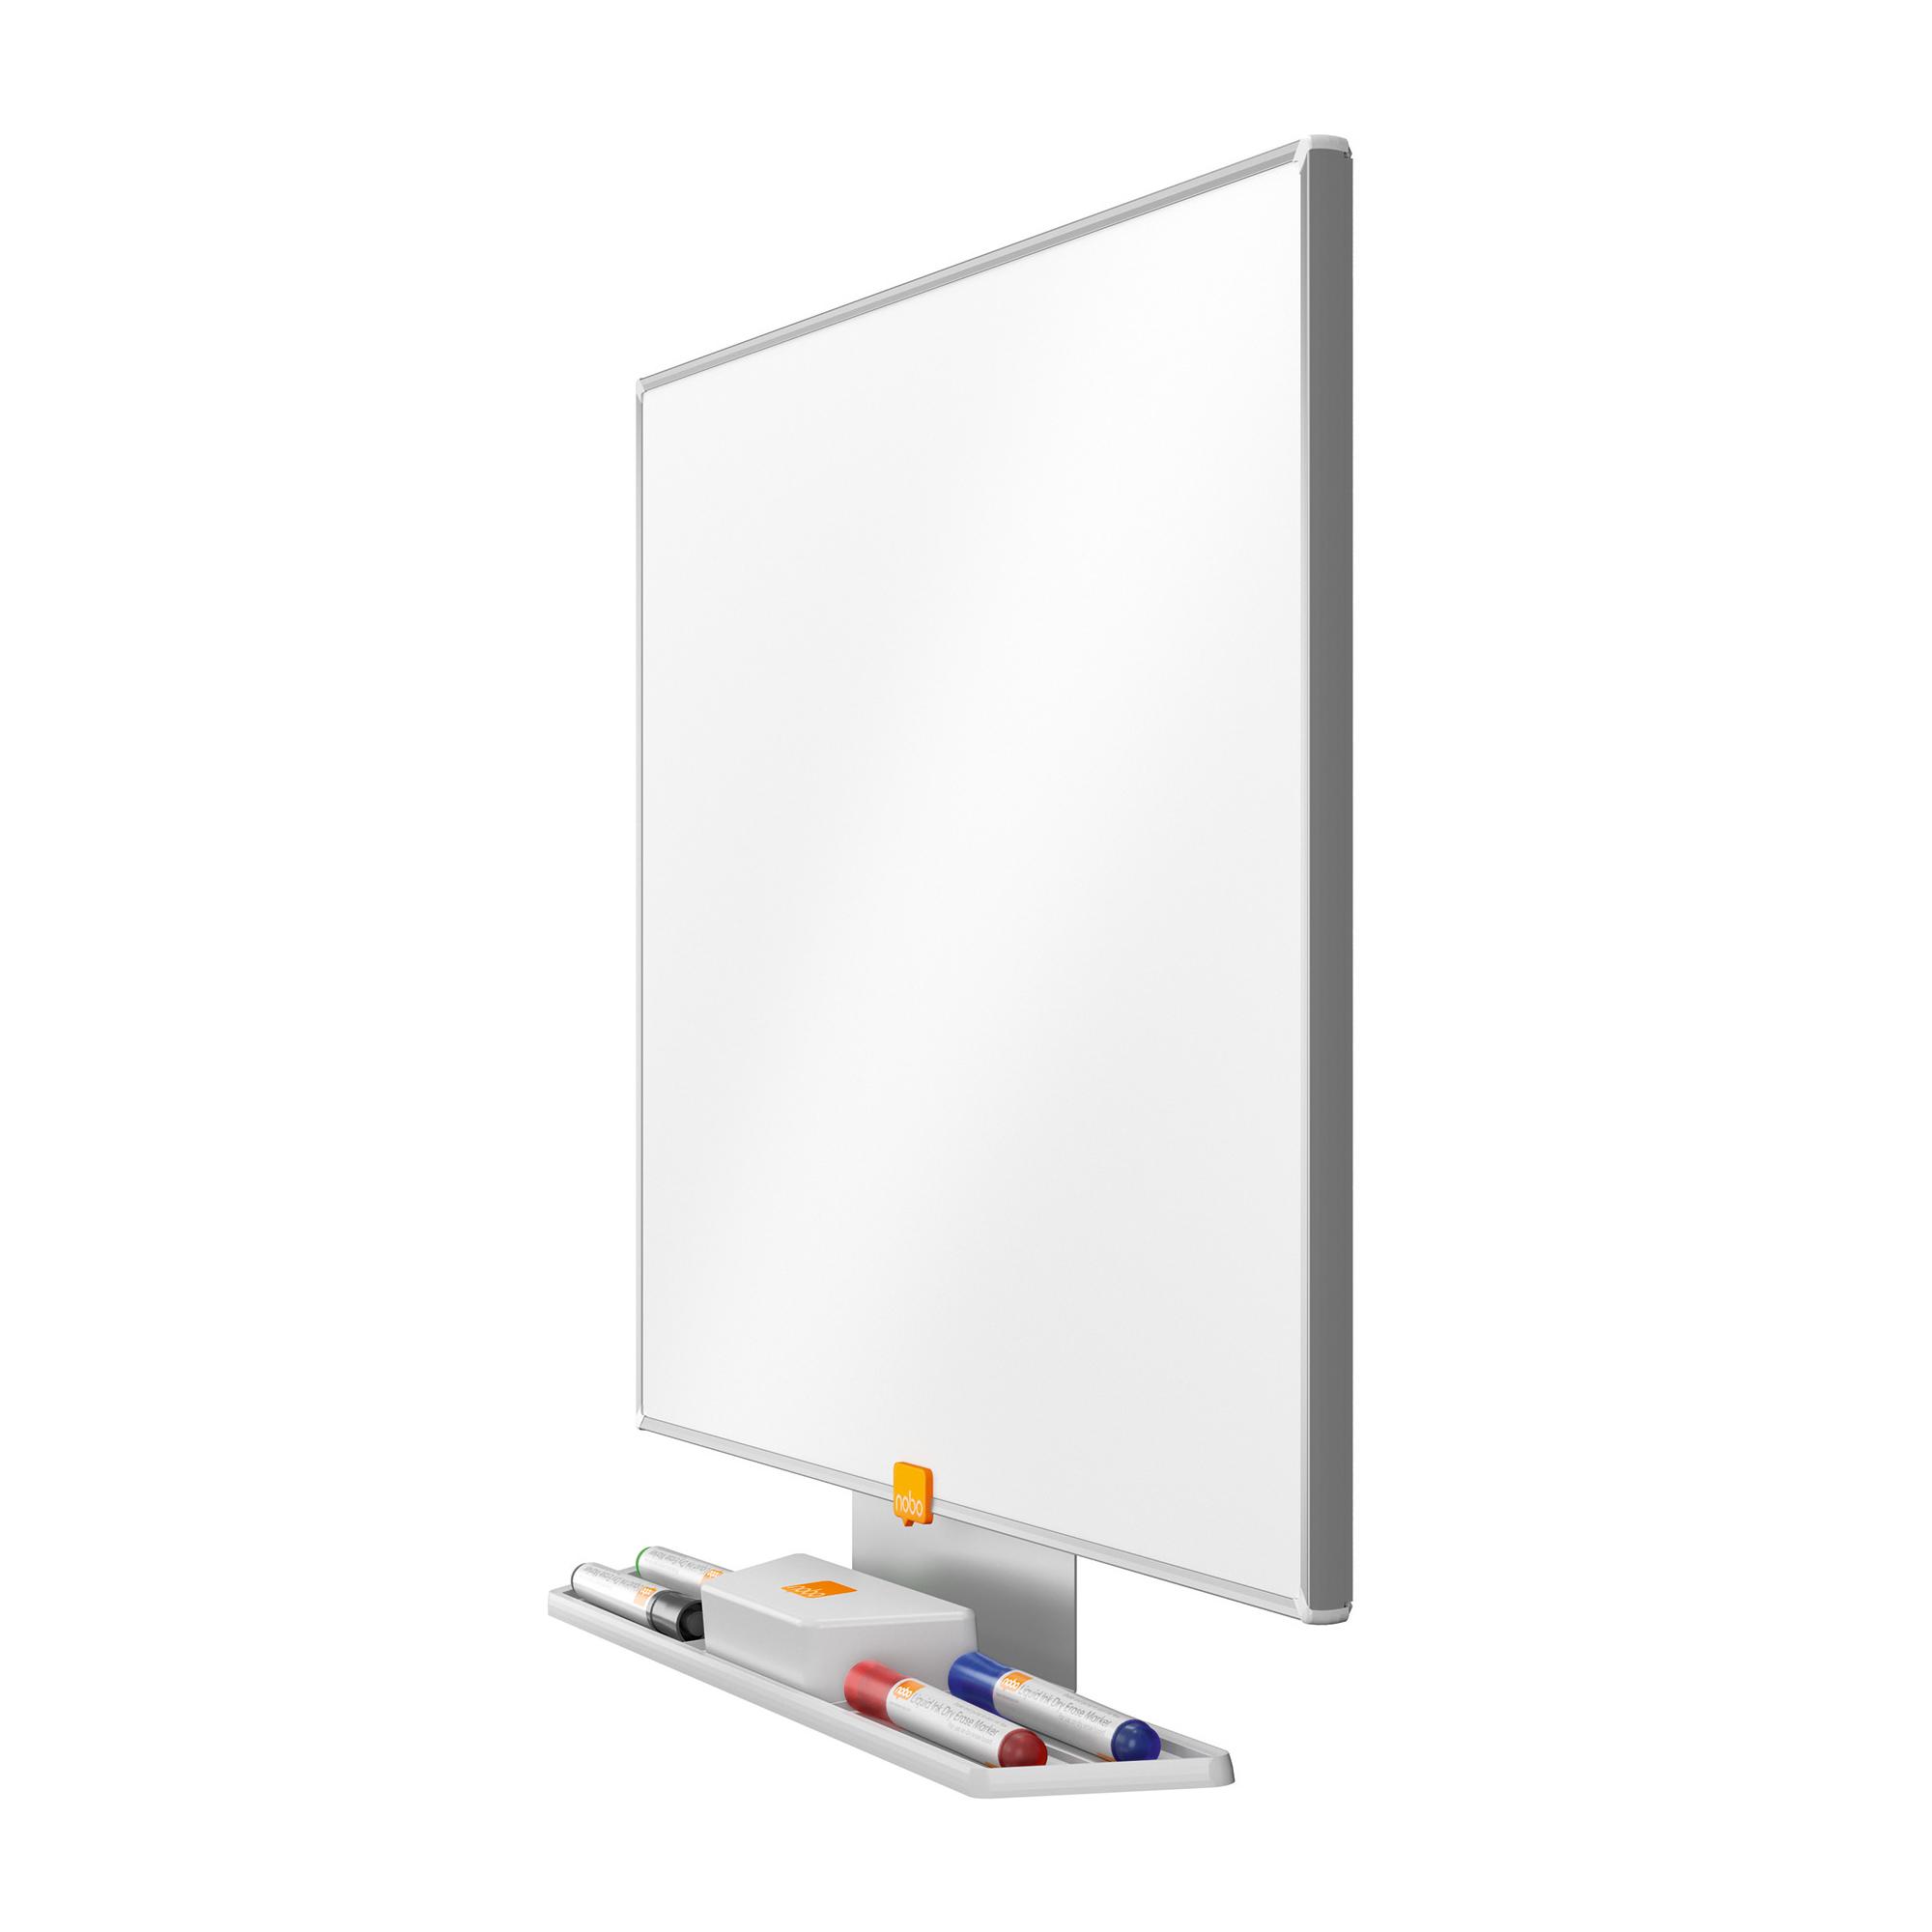 Nobo Classic Nano Drywipe Board Magnetic Steel with Fixings Slim Frame W600xH450mm White Ref 1902641